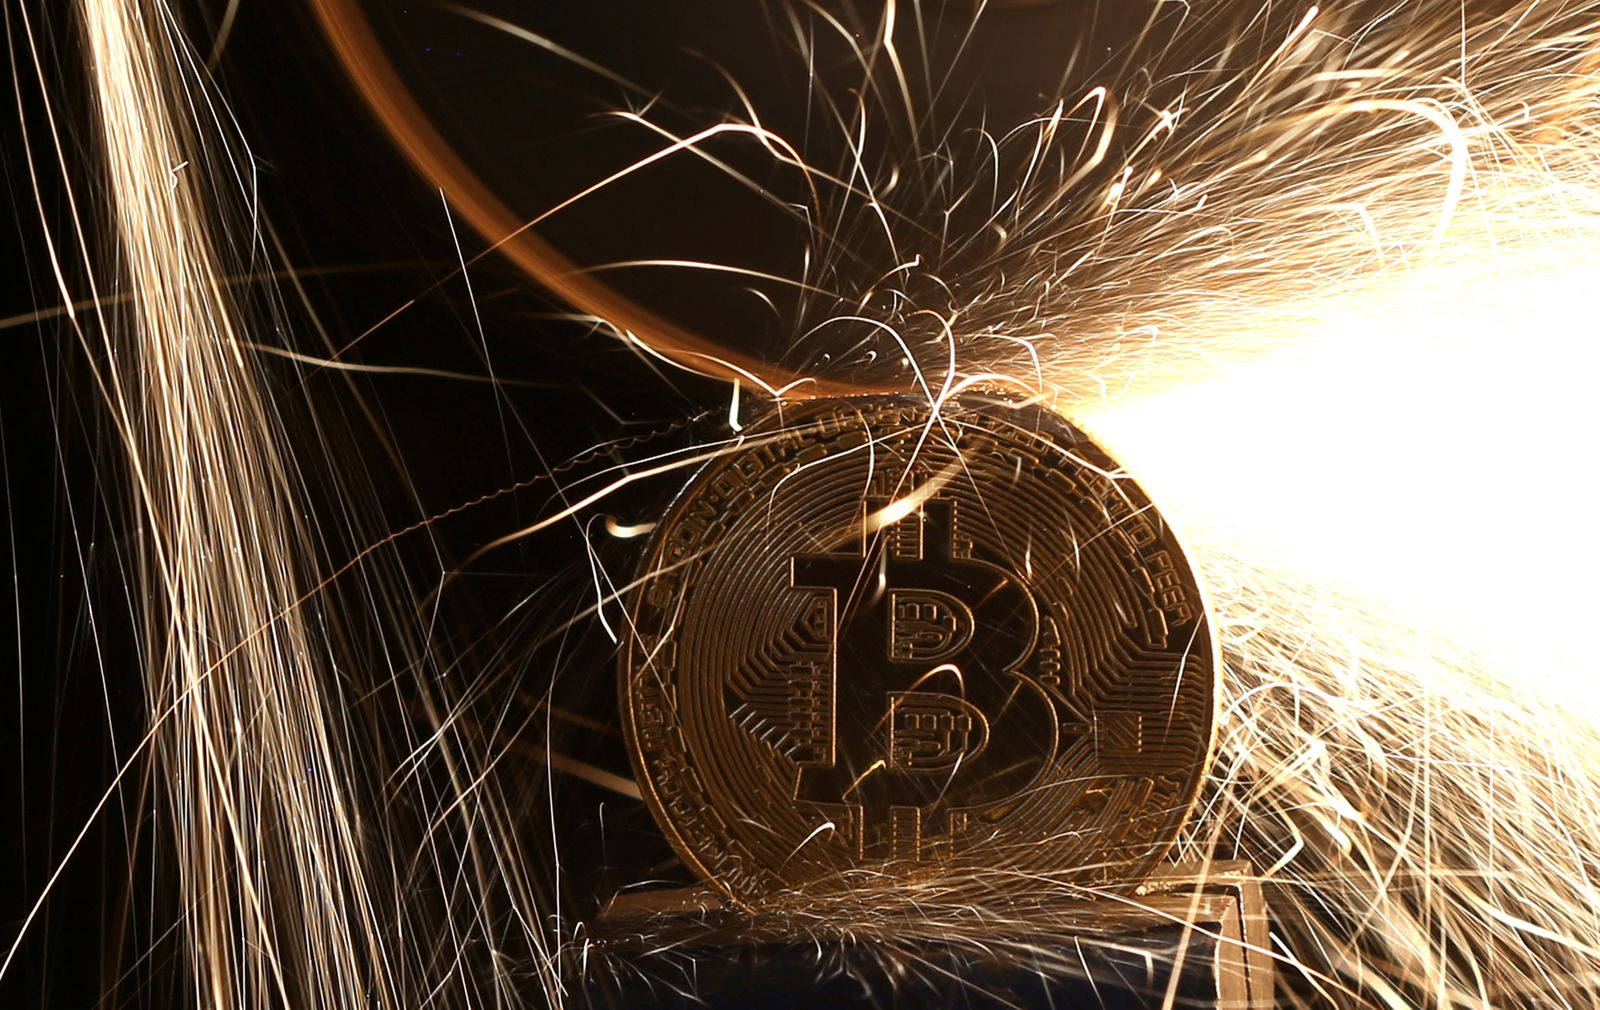 Bitcoin Funken